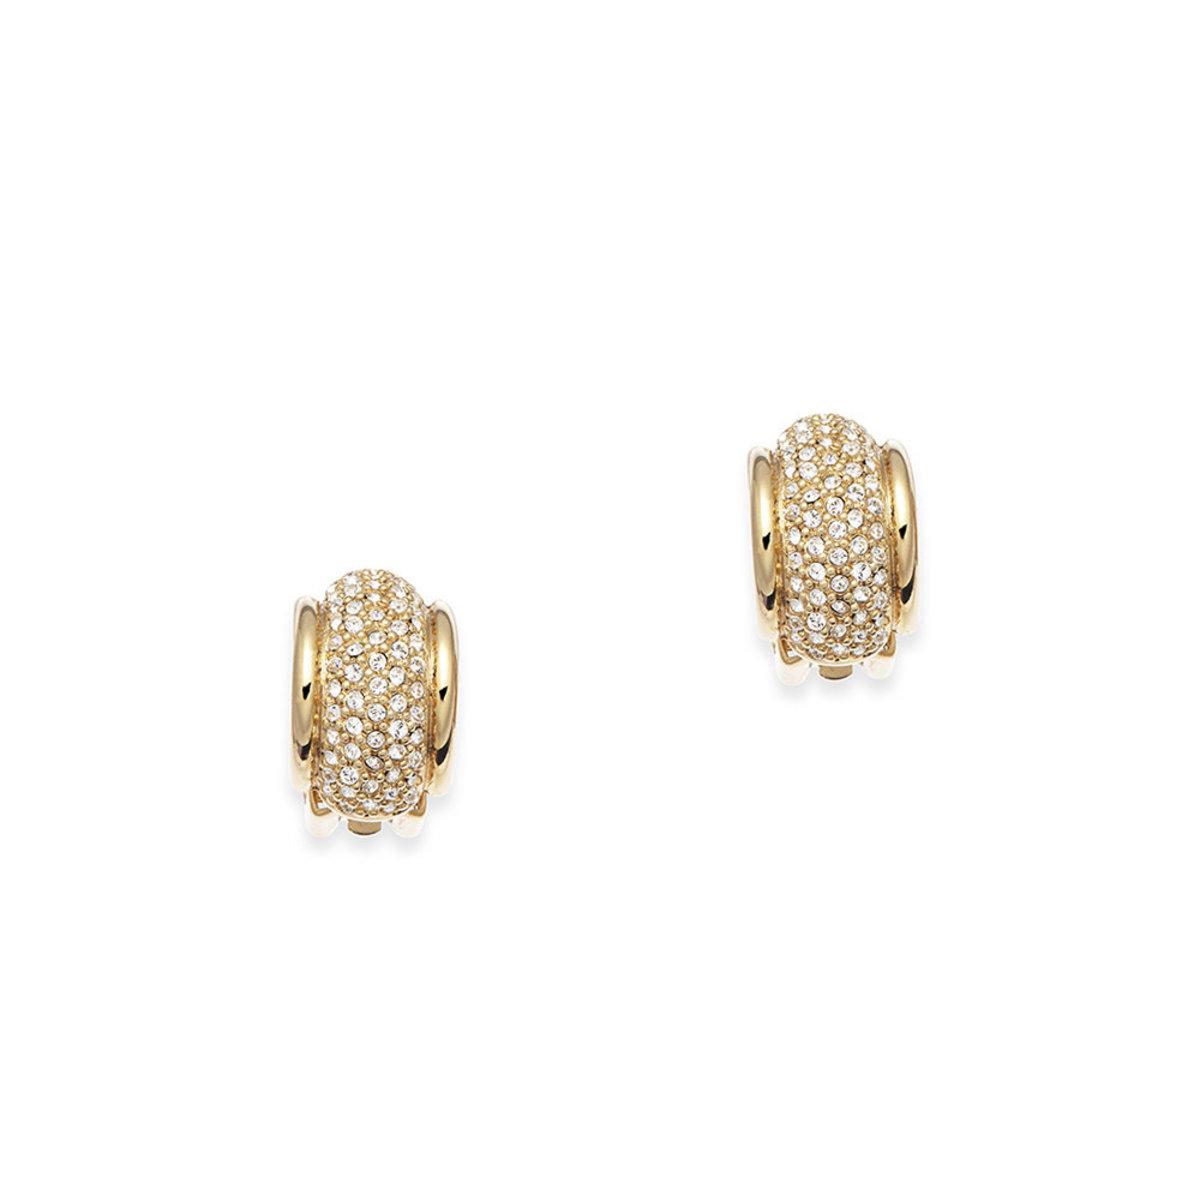 Tresor: gold plating, Swarovski crystal clip earrings